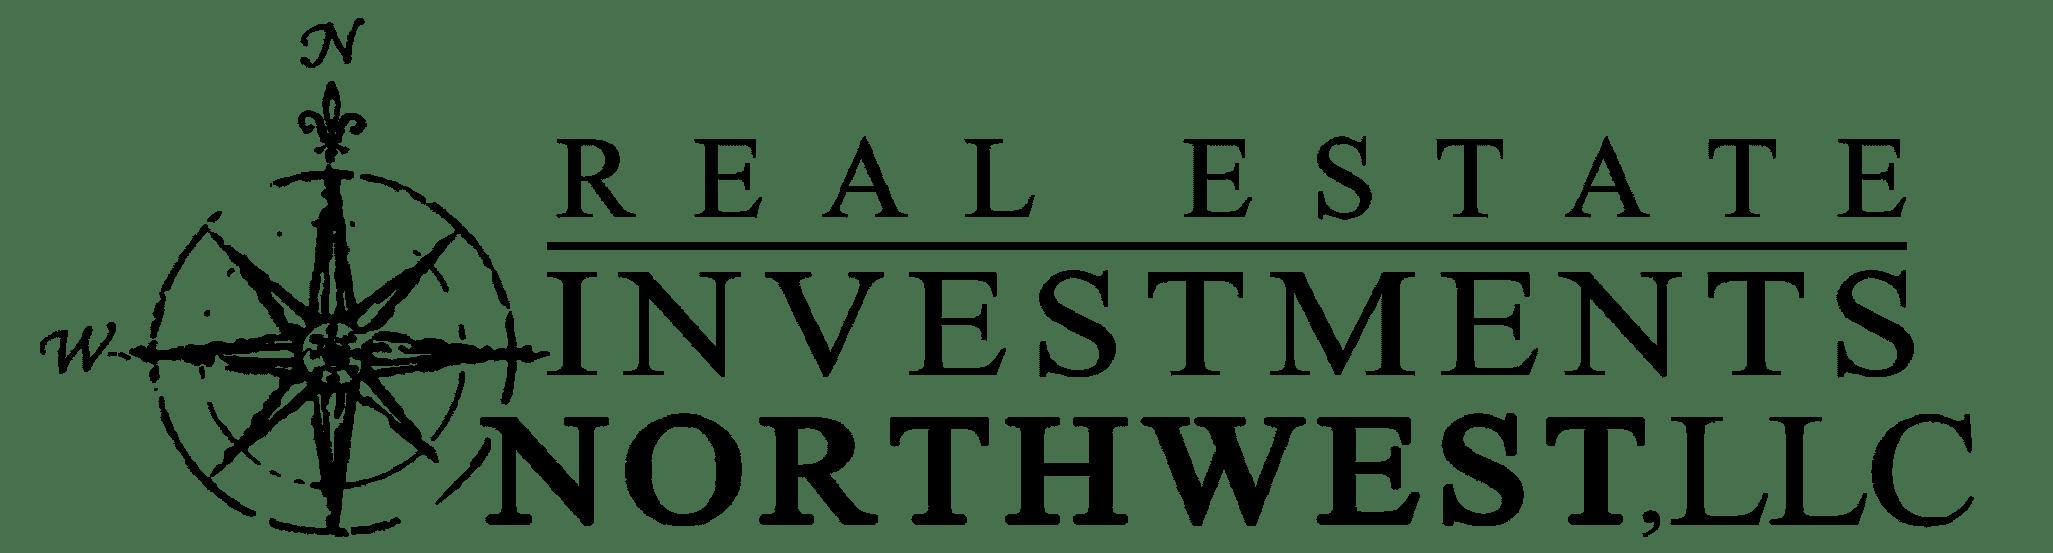 Real Estate Investments Northwest